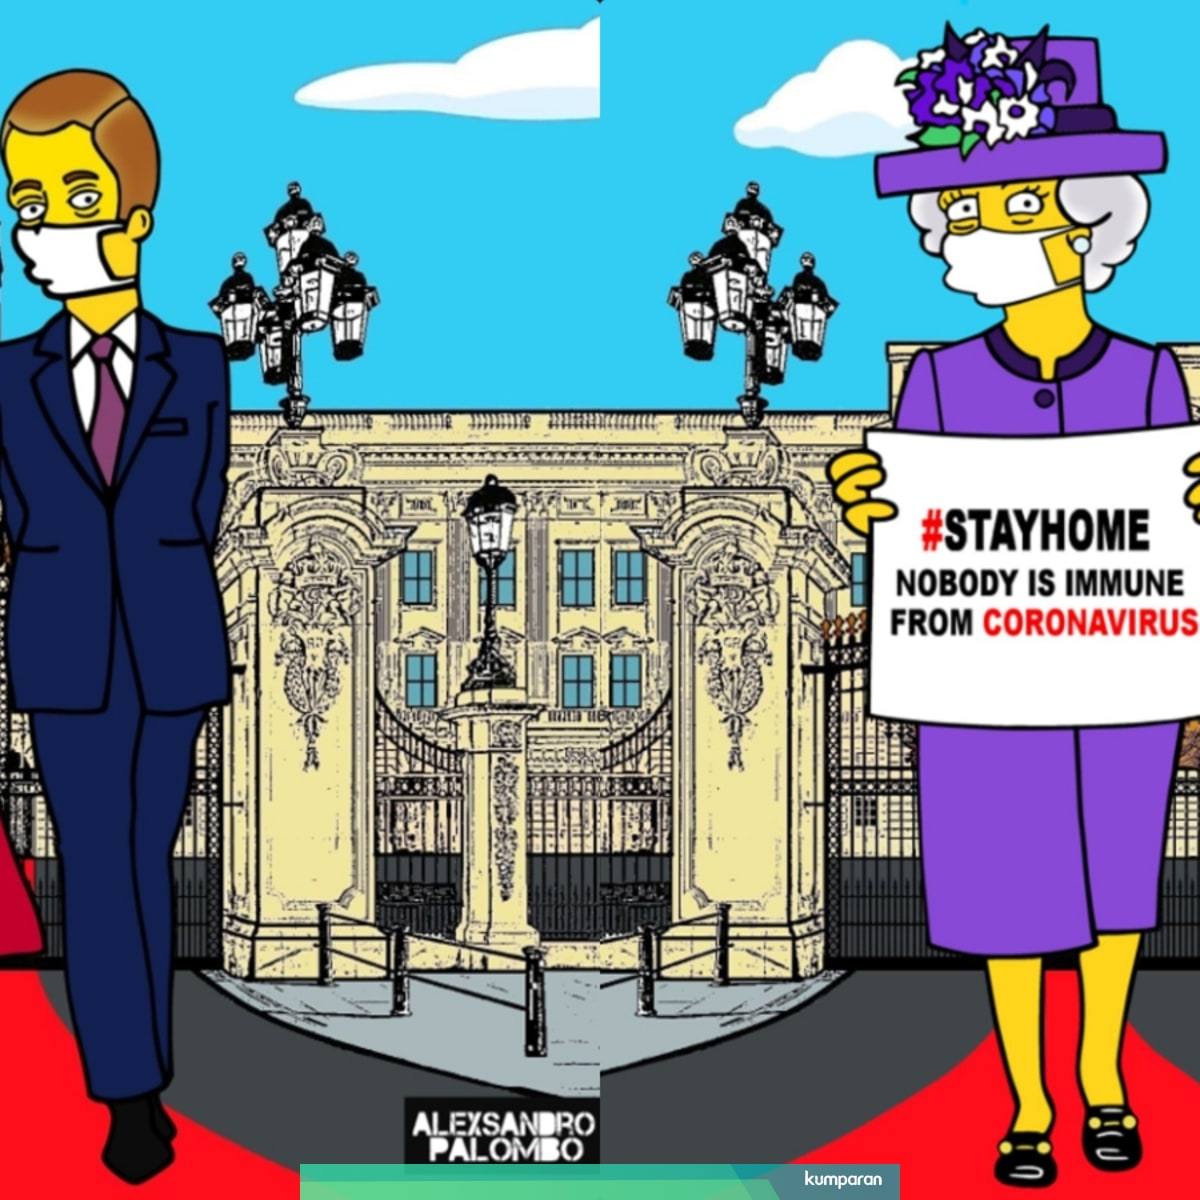 Gambar Kartun Unik Keluarga Kerajaan Inggris Untuk